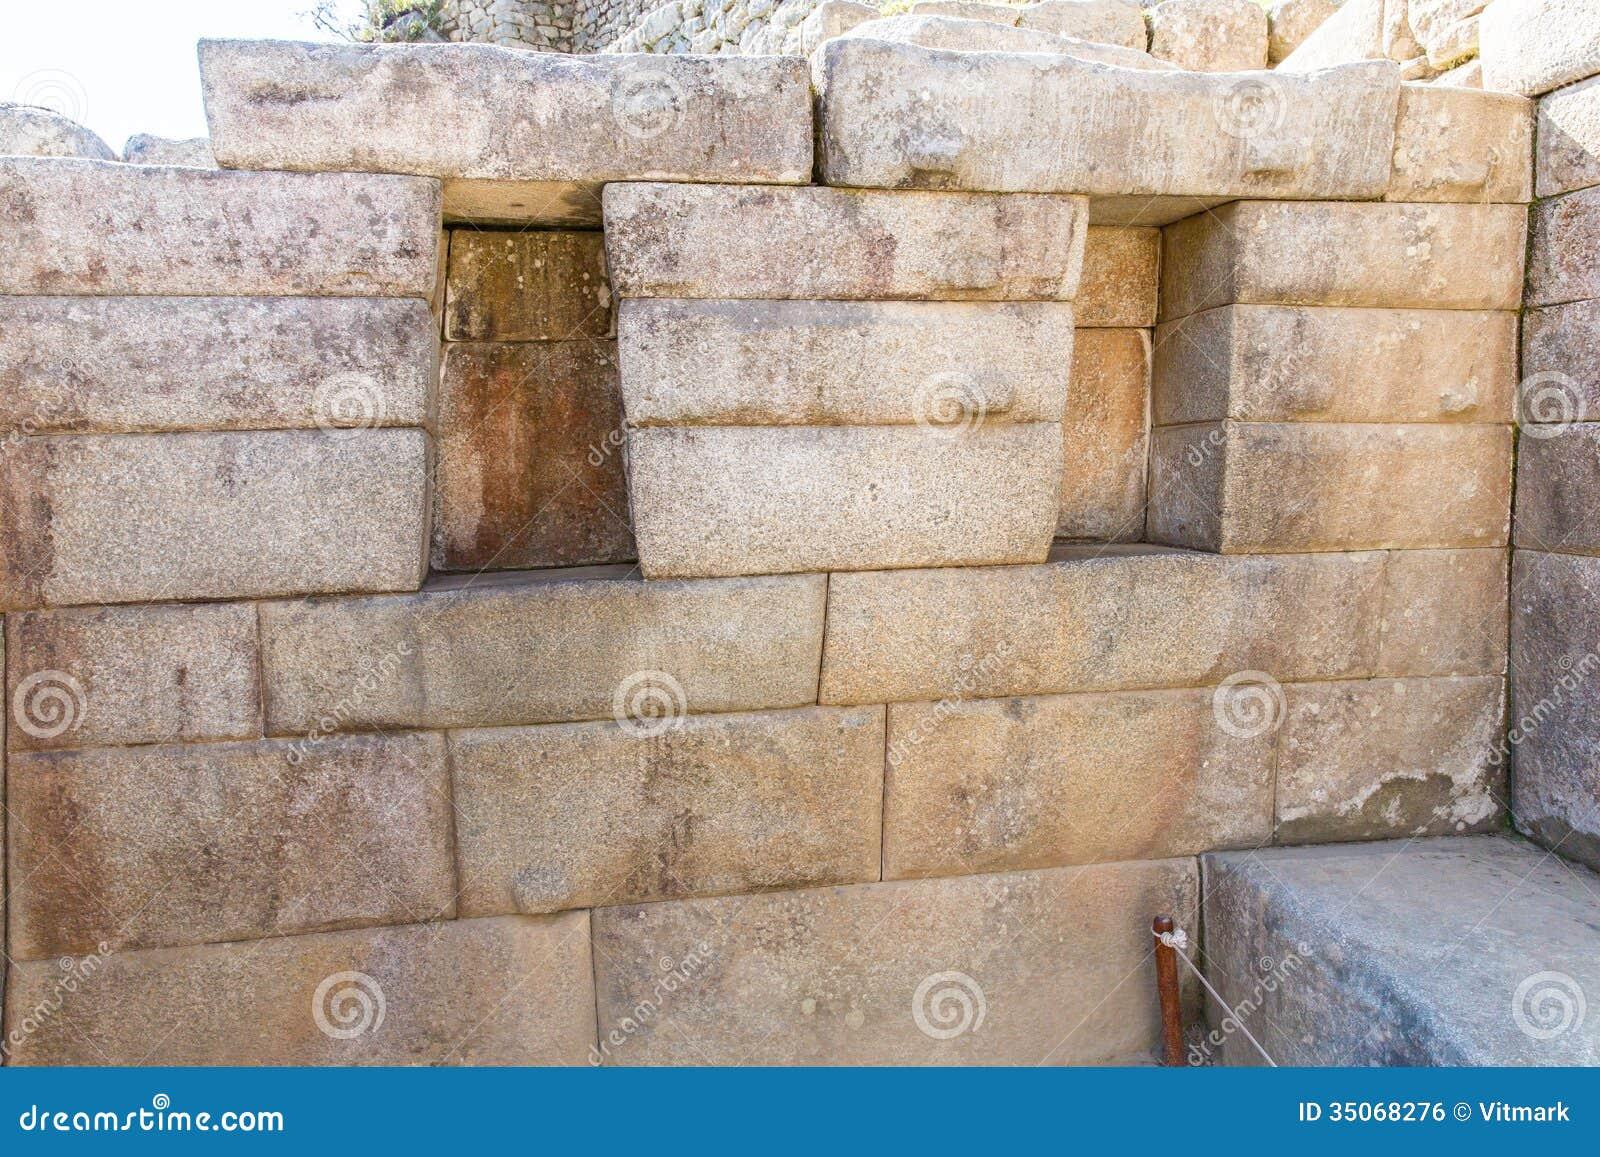 Inca wall in machu picchu peru south america example of for American brick and stone